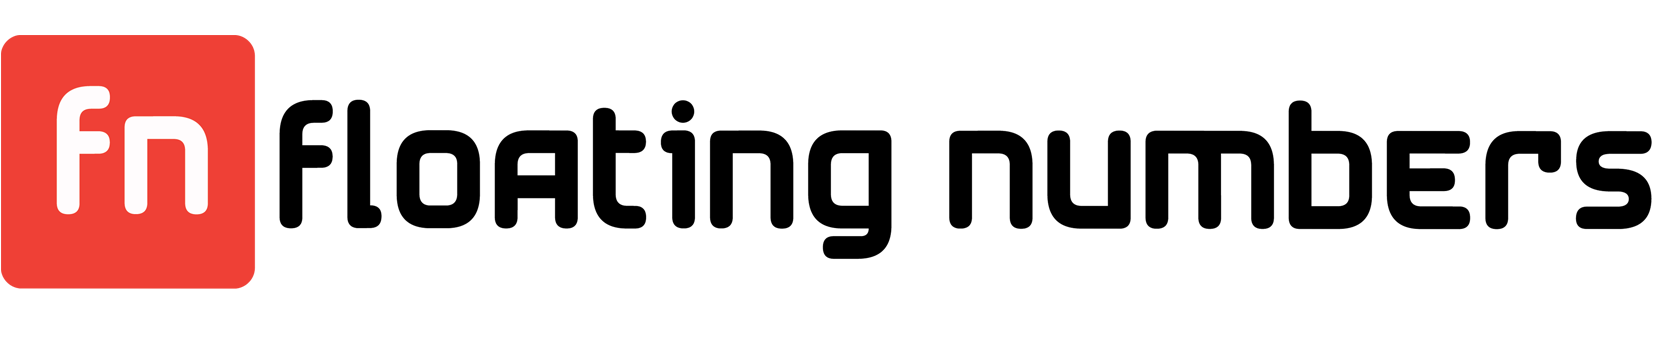 Floating Numbers Digital Solutions Pvt. Ltd. - Management company logo